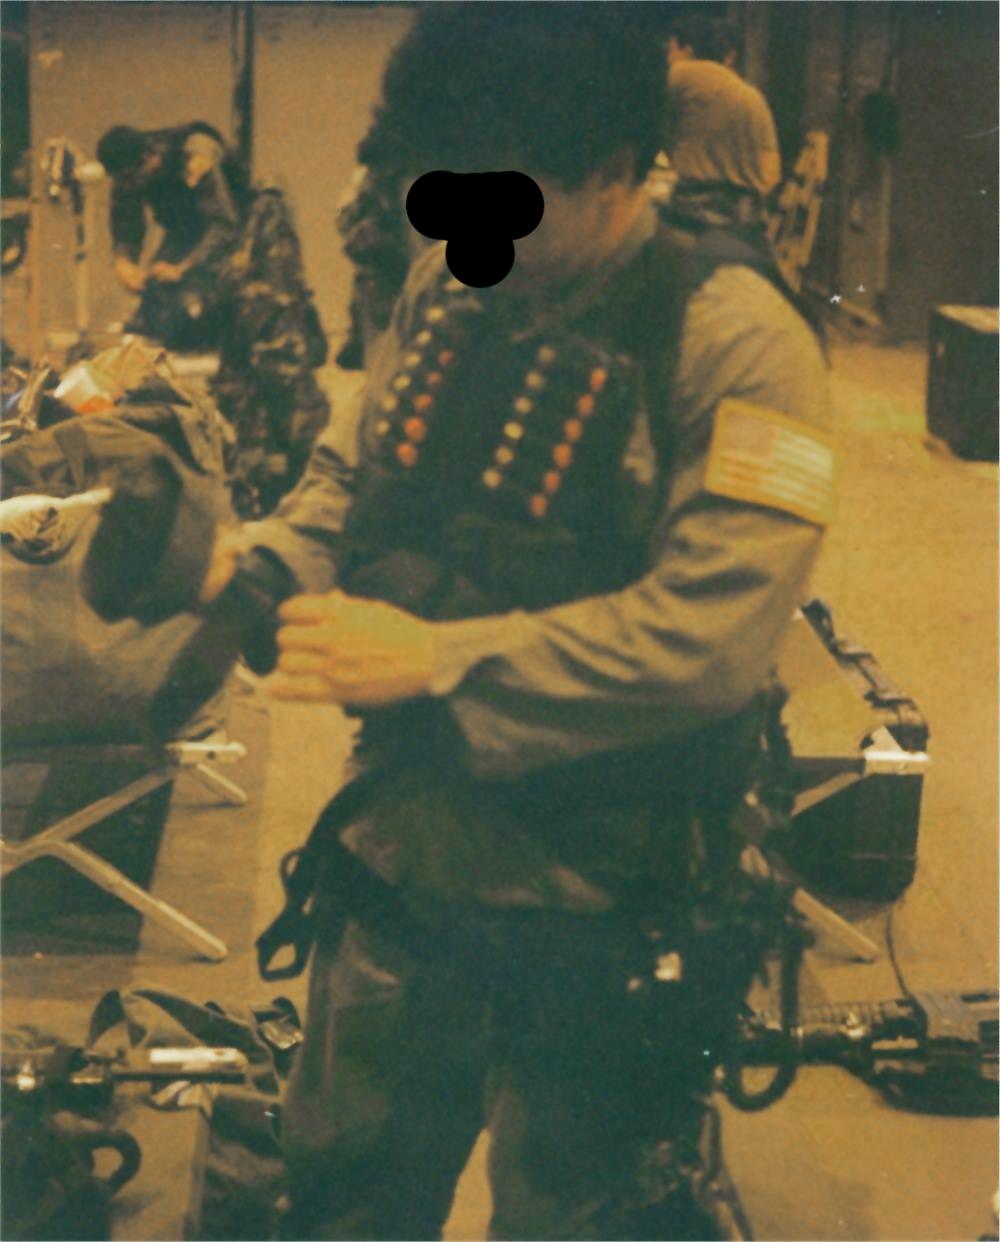 SON TAY RAIDER RAID VIETNAM SPECIAL FORCES POCKET PATCH M//E CURRENT MFG